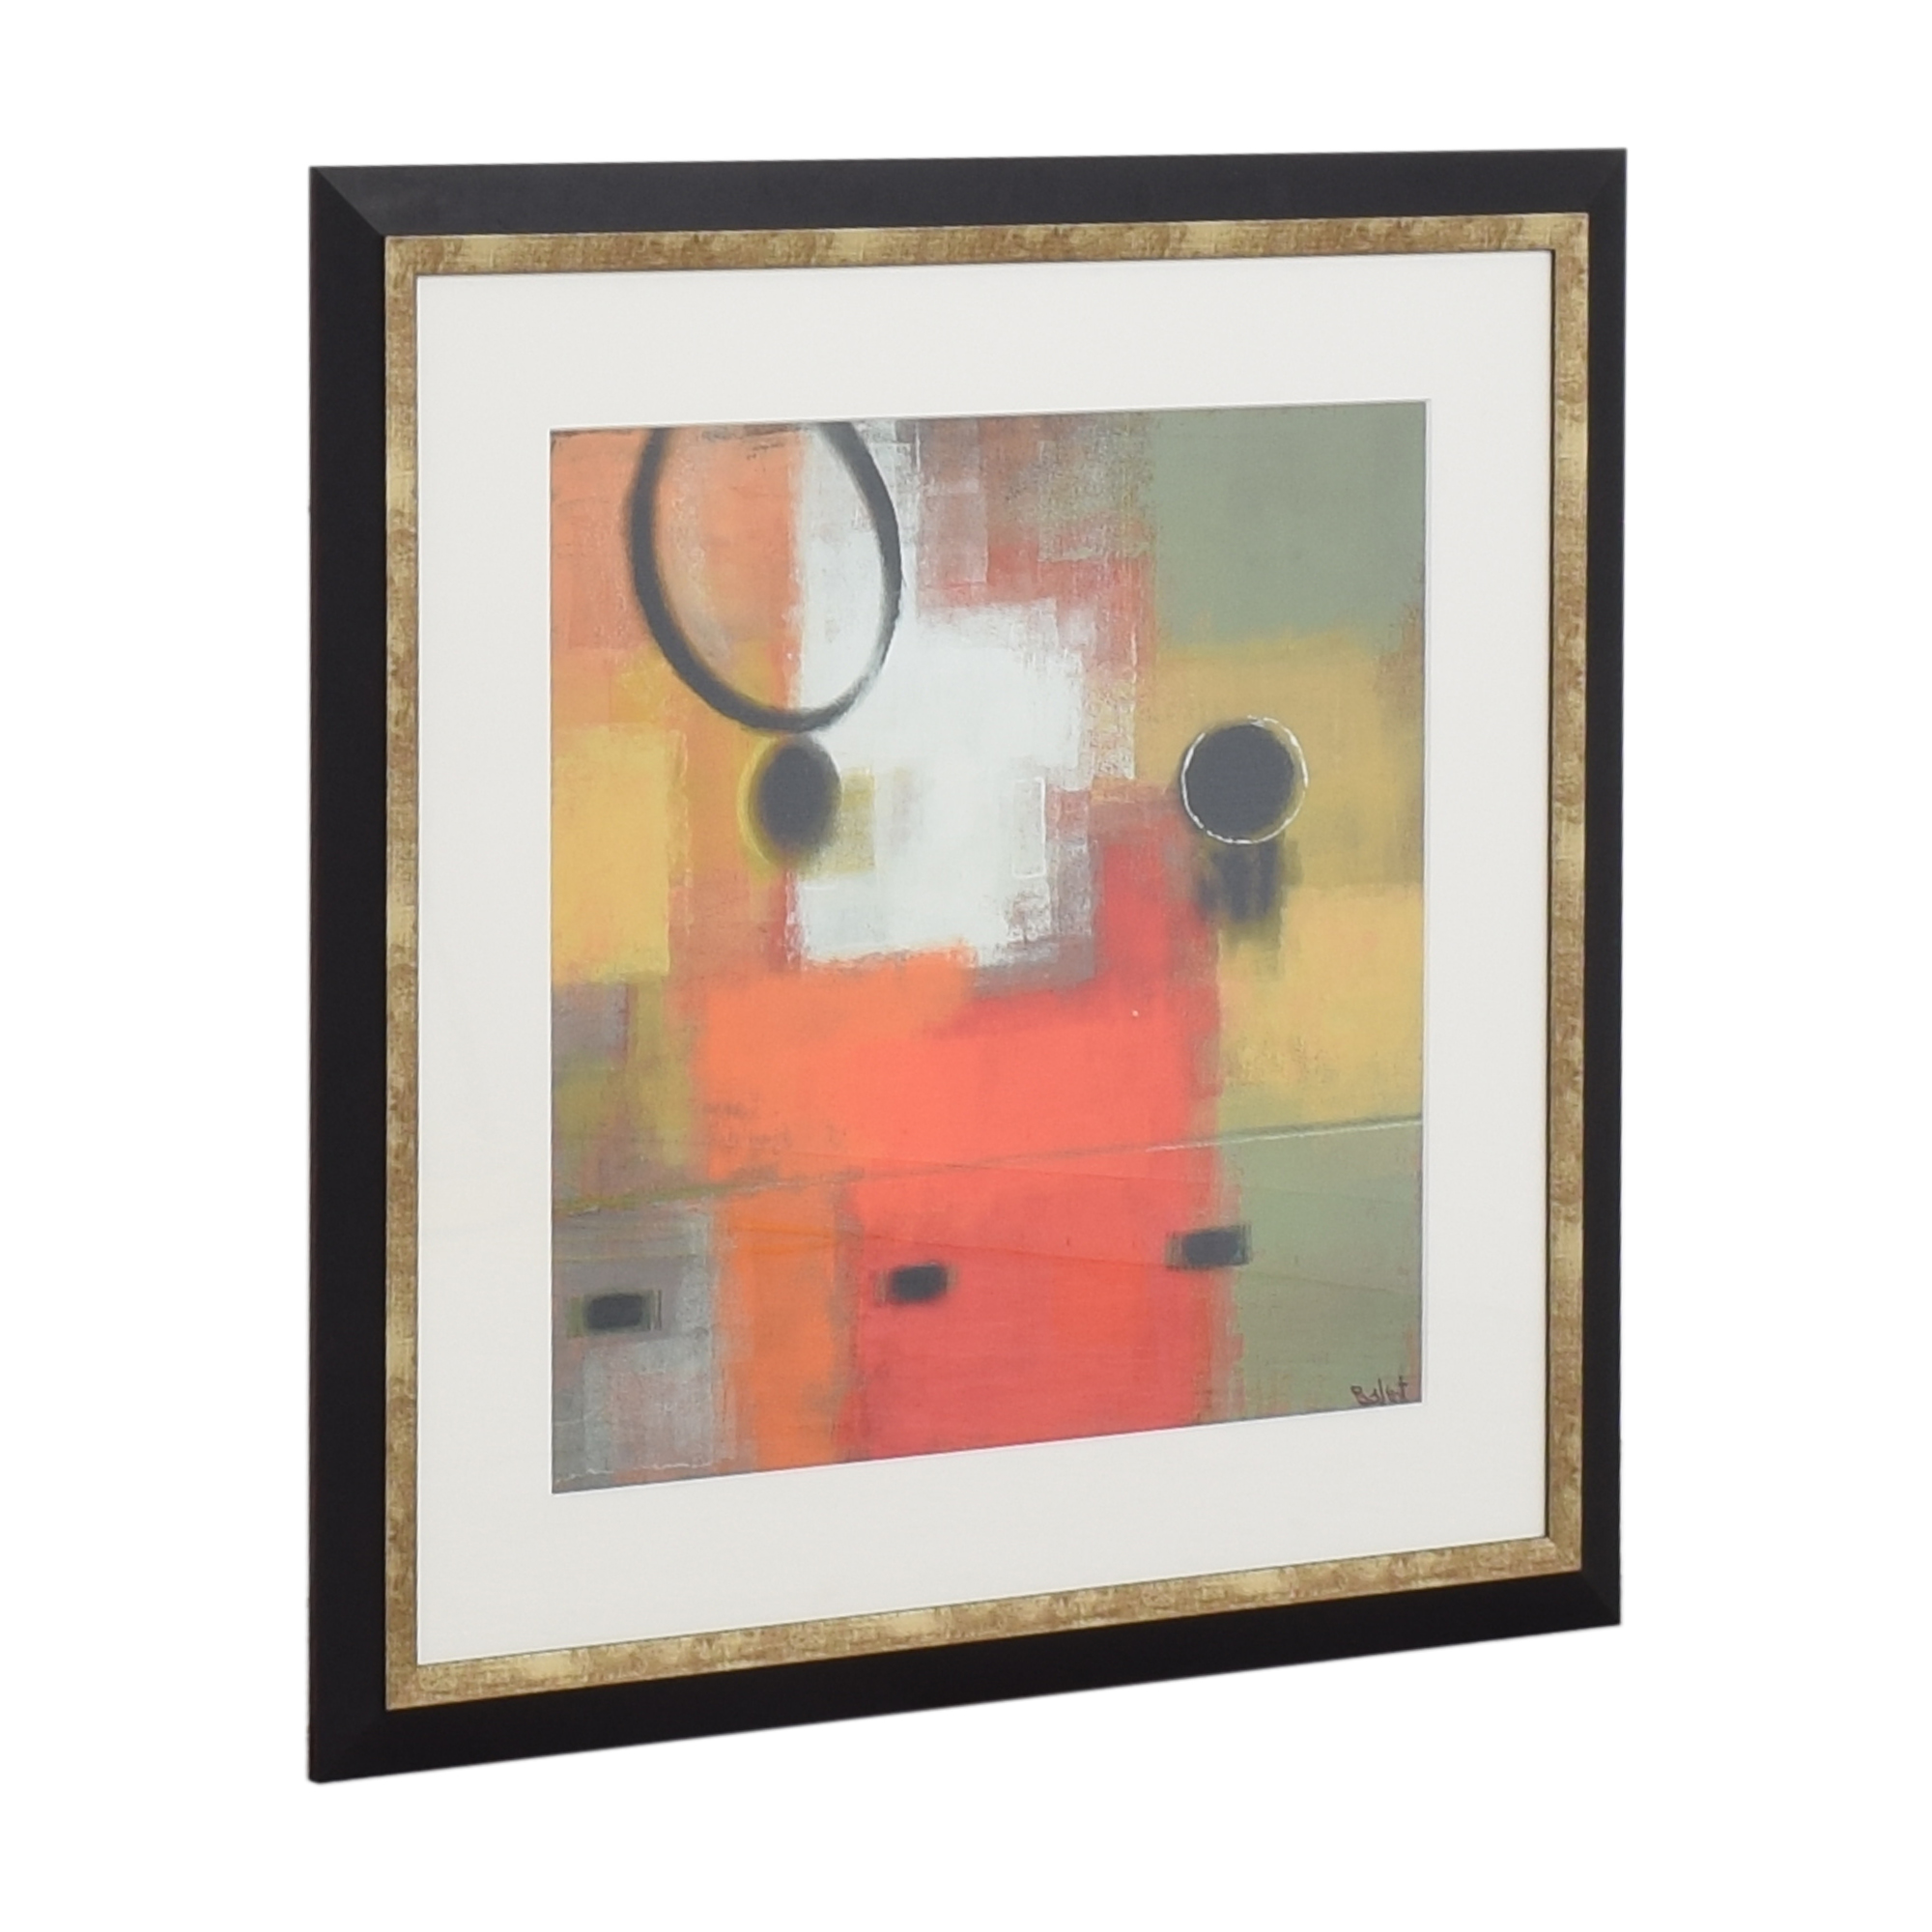 Eric Balint Escorial I & II Framed Wall Art Decor